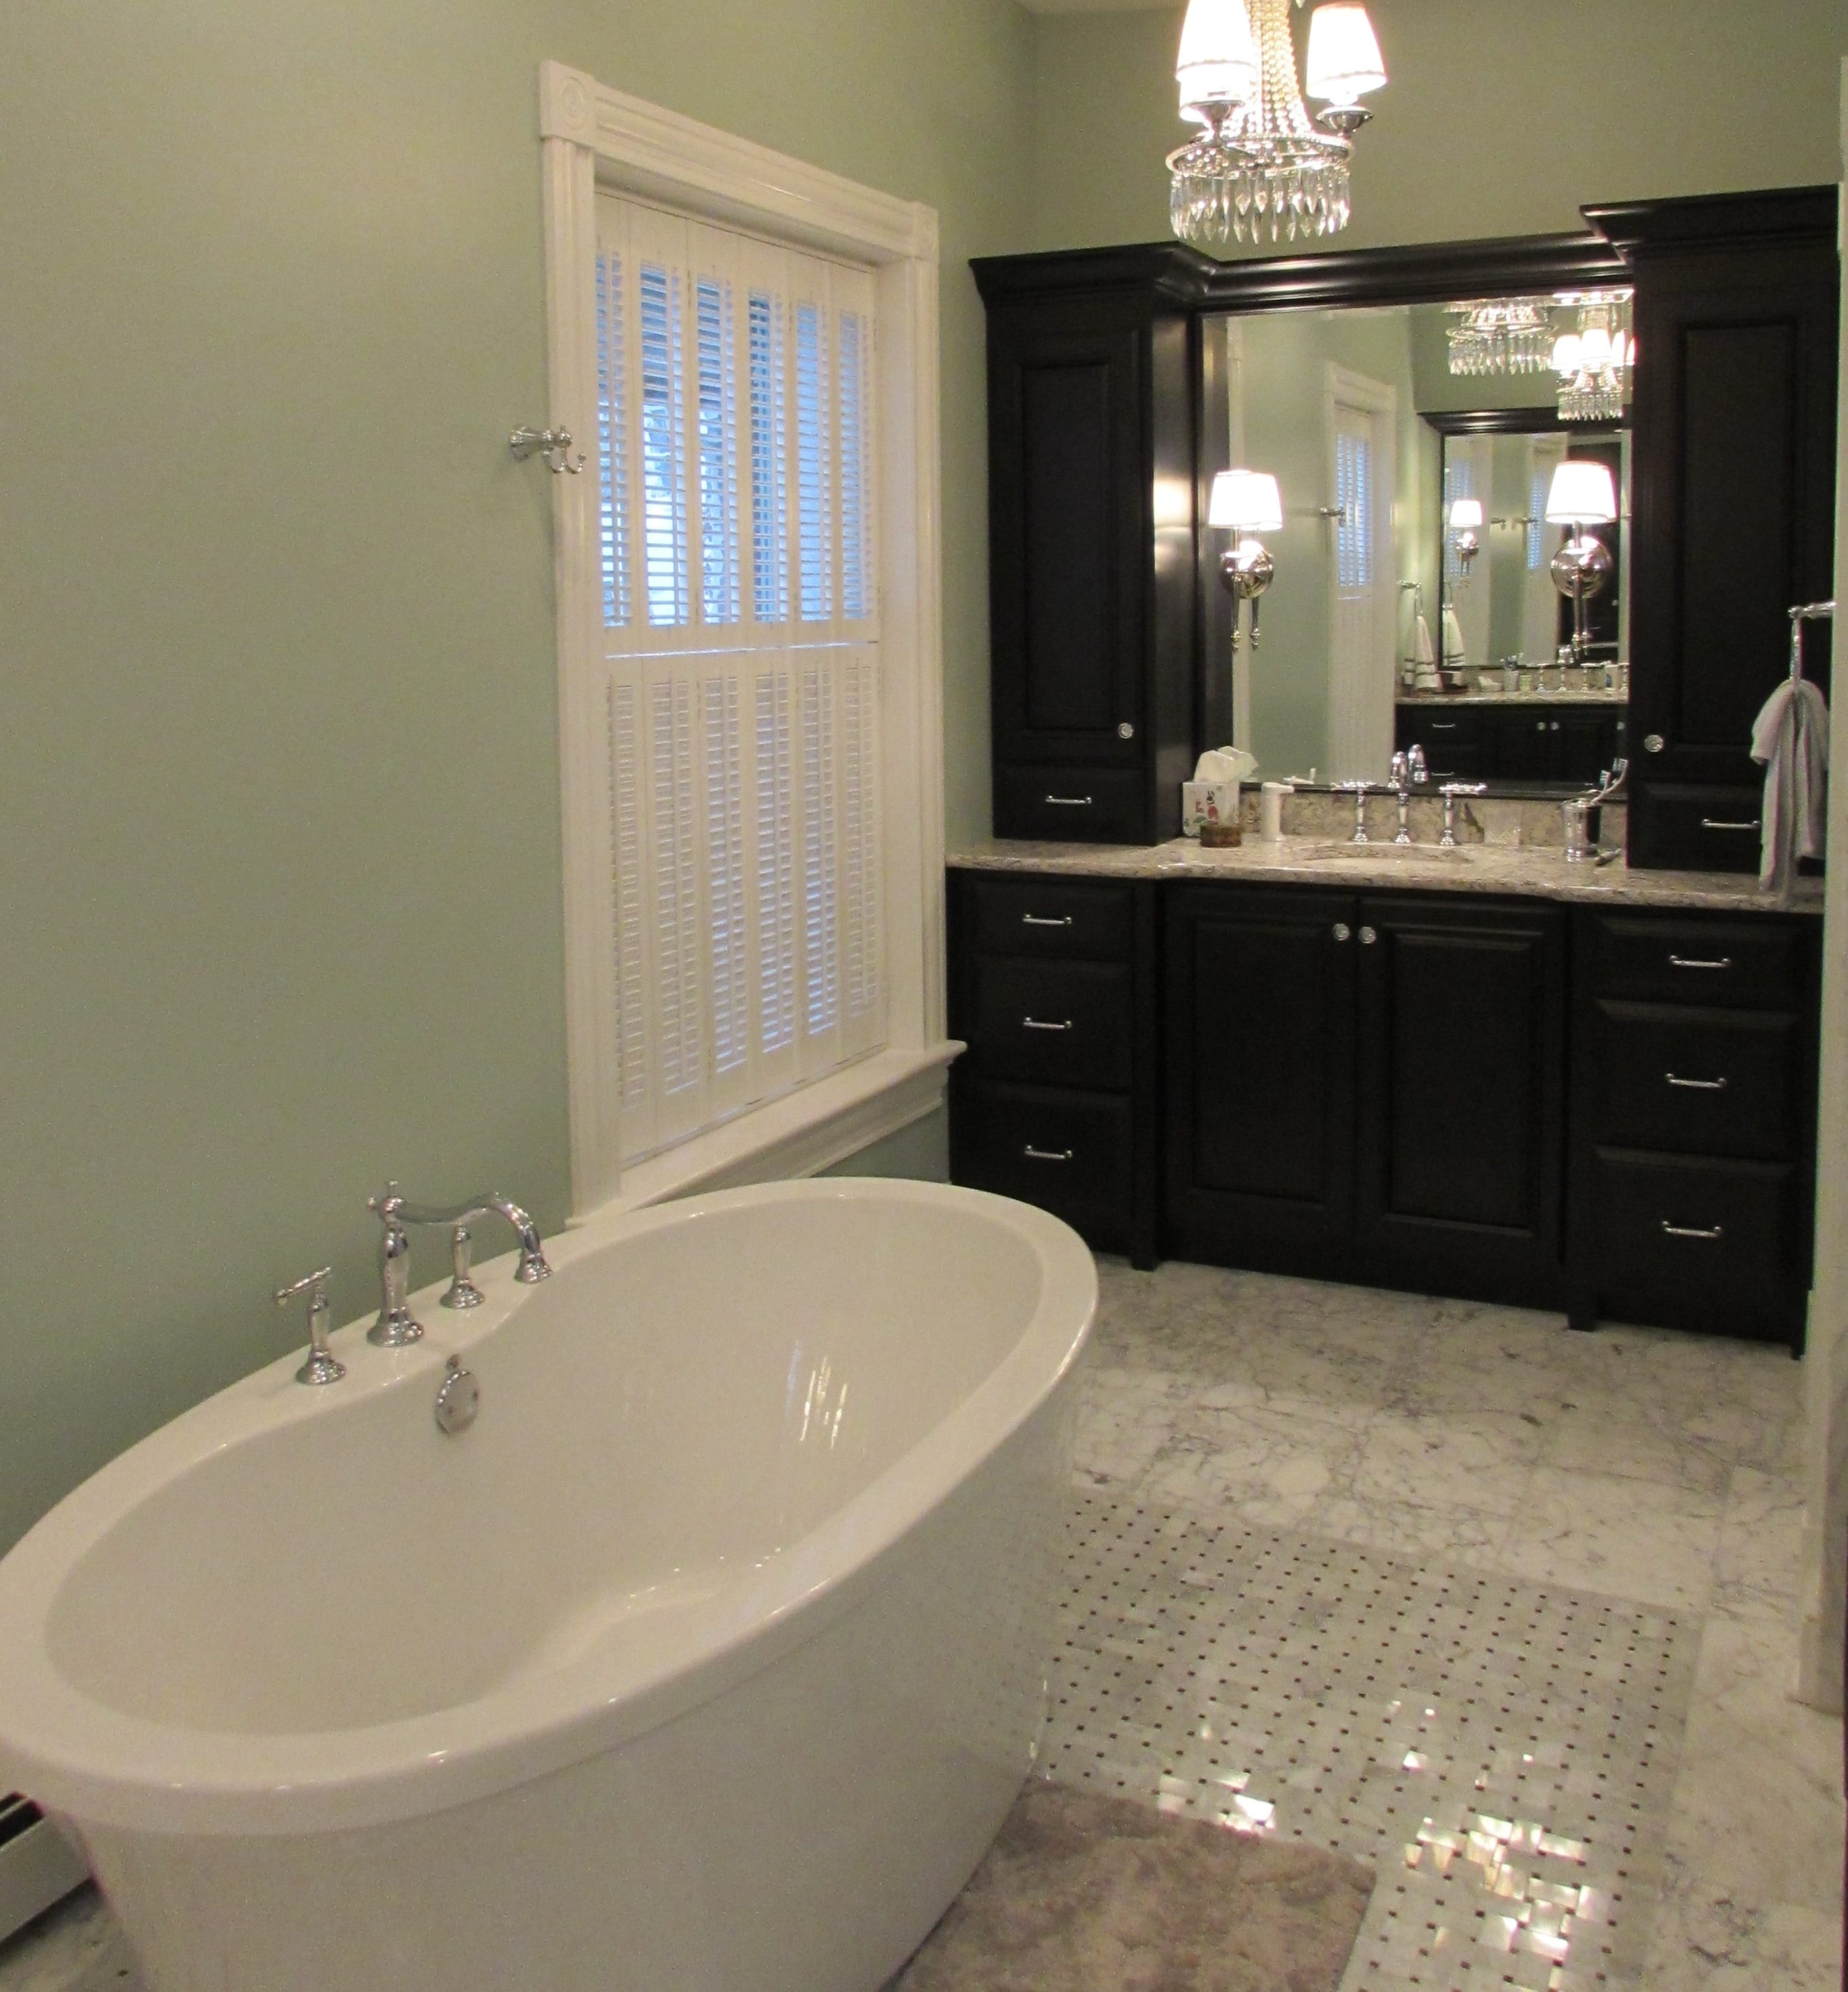 Downtown Frederick master bathroom remodel - Talon ...